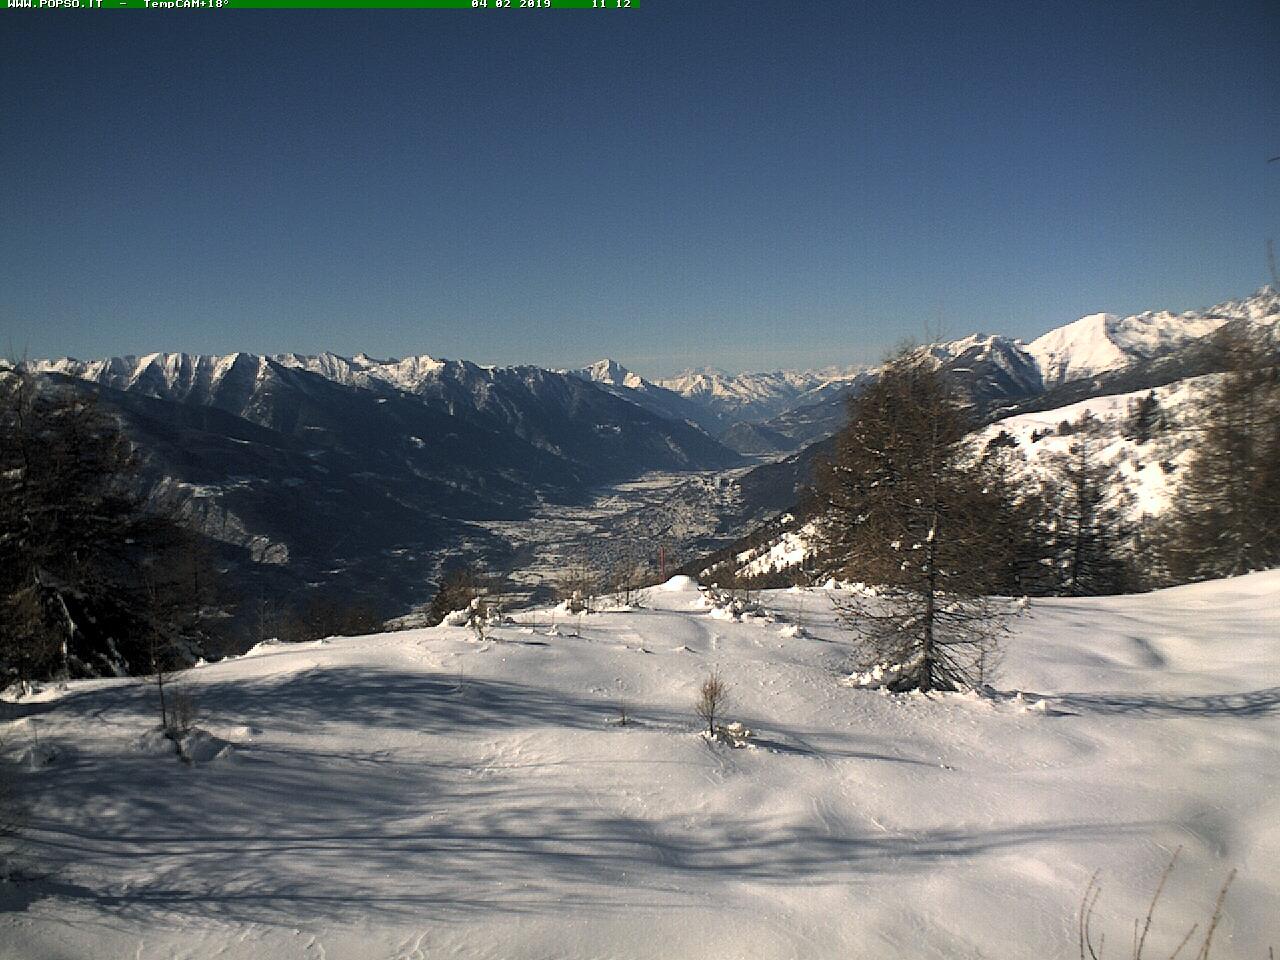 Nowcasting Valtellina, Valchiavenna, Orobie e Lario: INVERNO 2018-19-prato_01.jpg